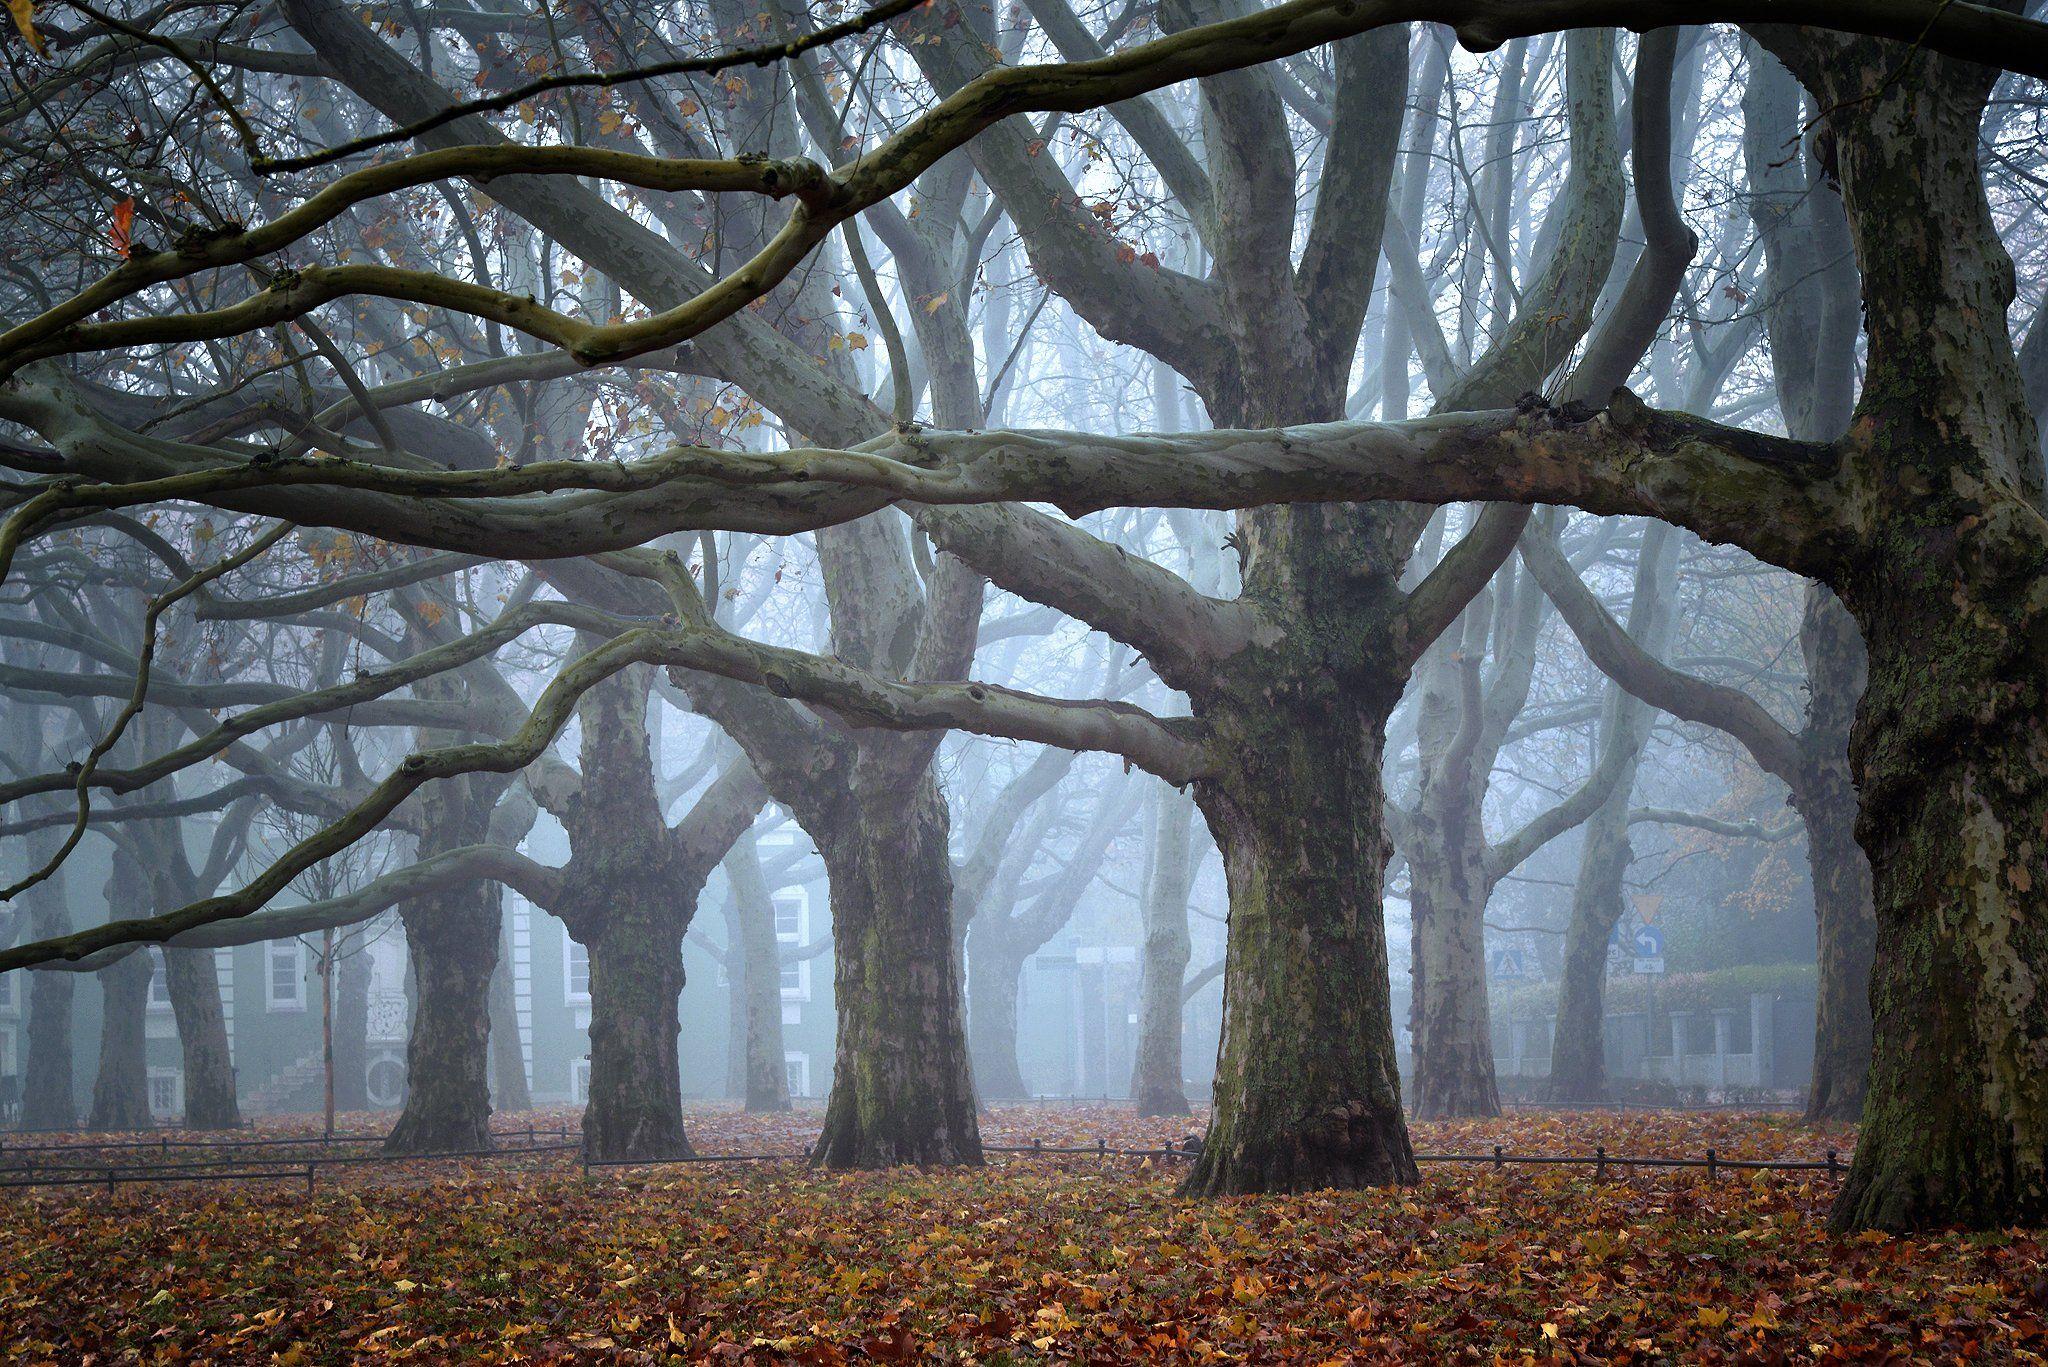 платаны trees magic mist morning tree foggy fog nature path autumn fall poland, Radoslaw Dranikowski